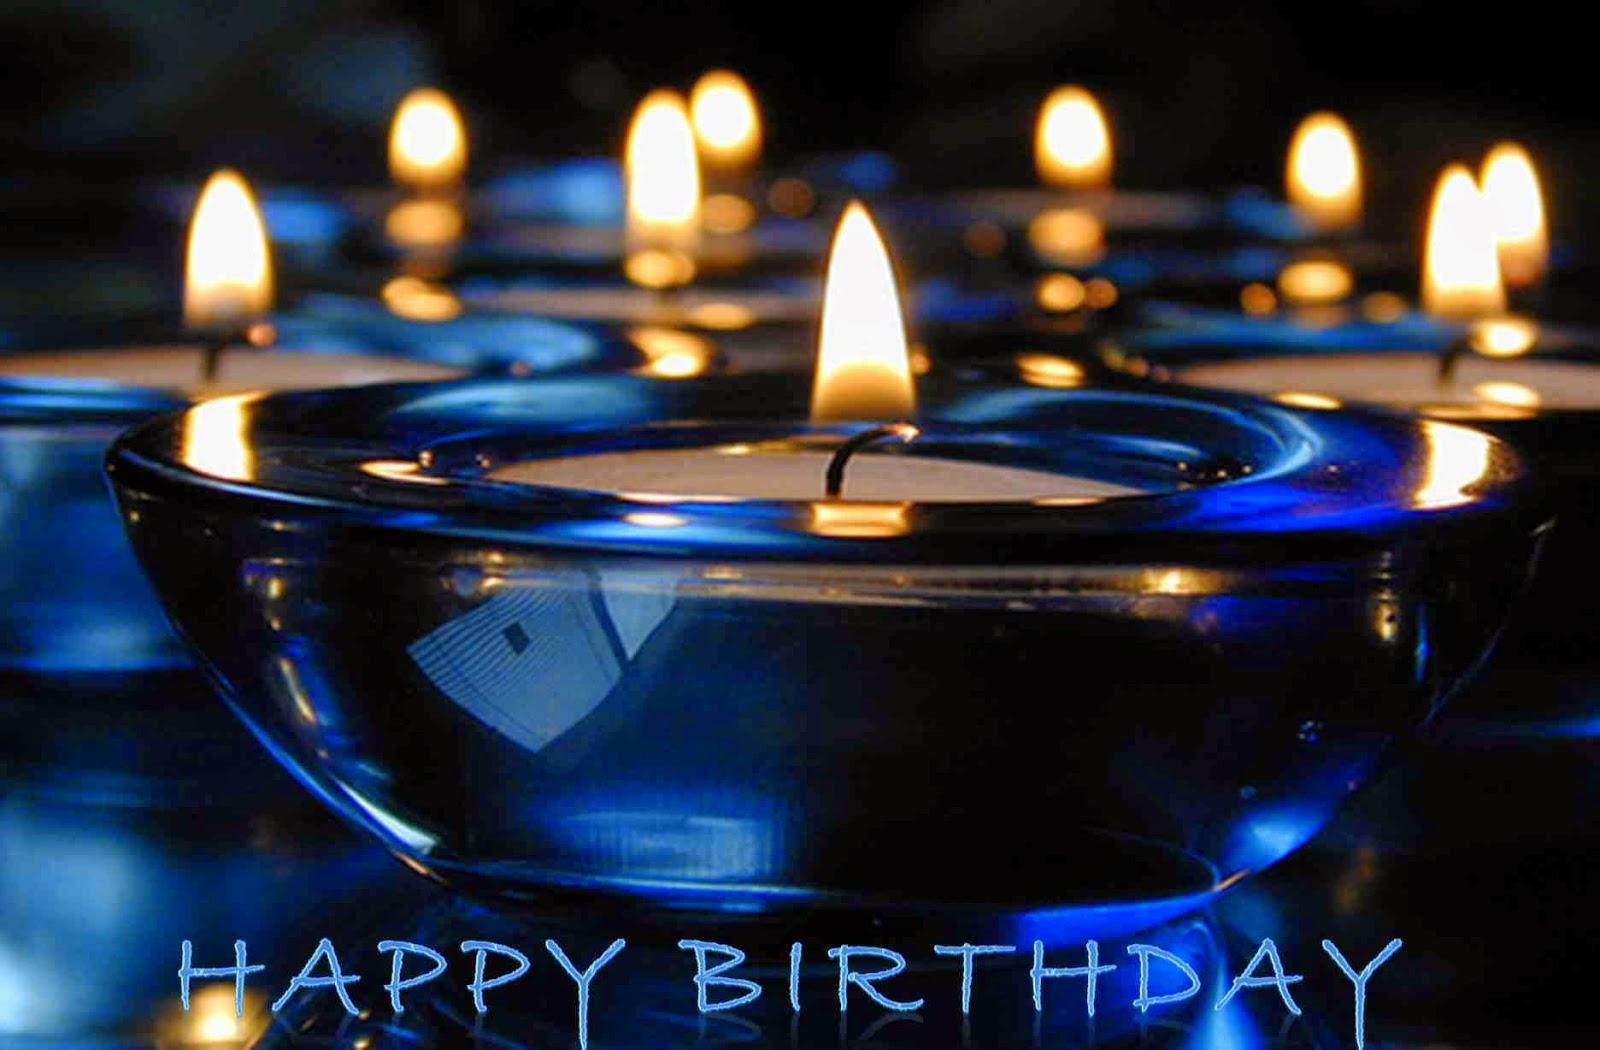 birthdaywish photos, latast photo, HD Images, Wallpaper ...